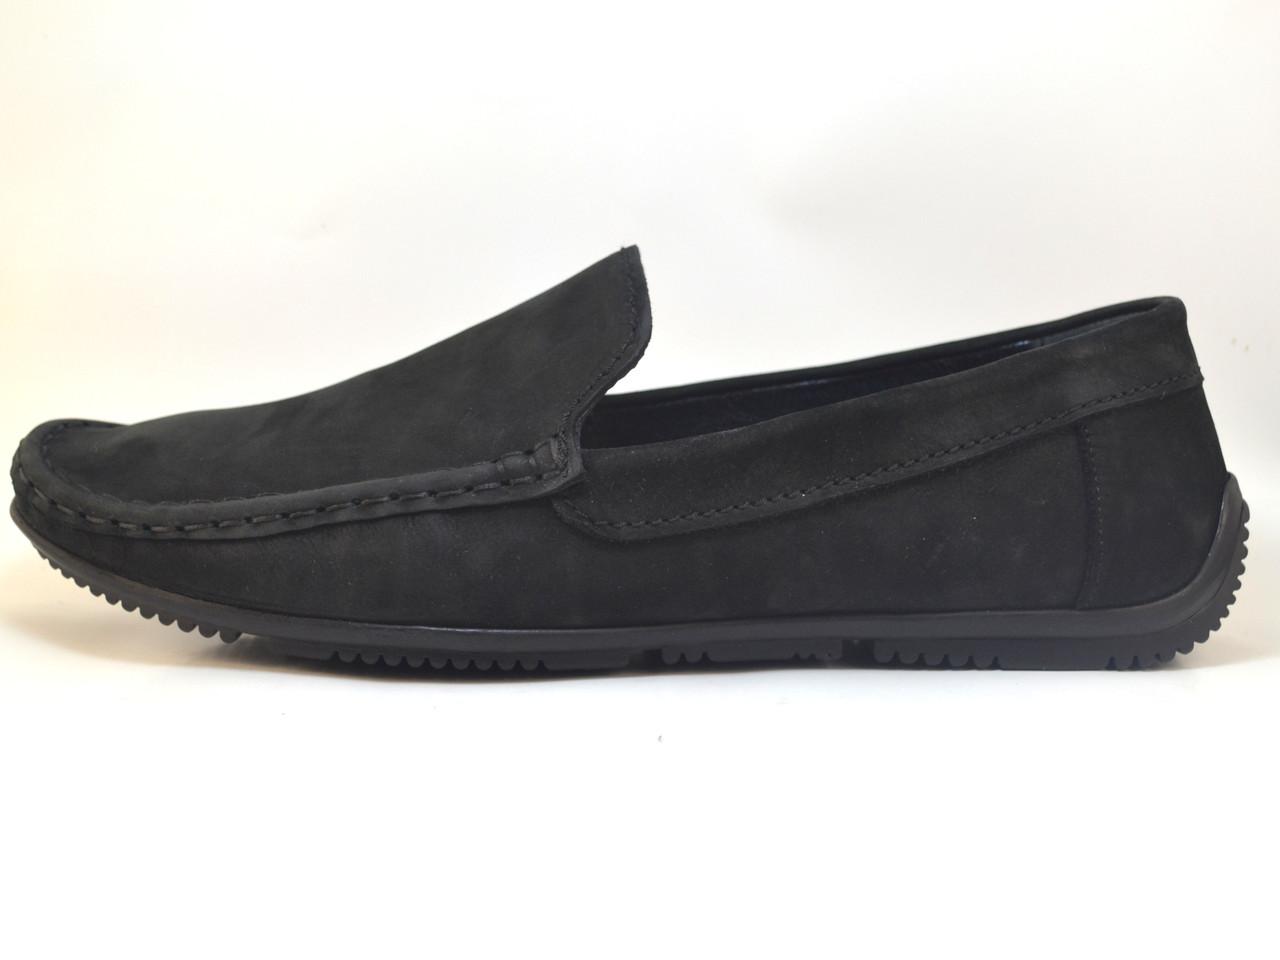 Обувь мальчик. Кожаные мокасины нубук Rosso Avangard. Alberto mS Black Nub